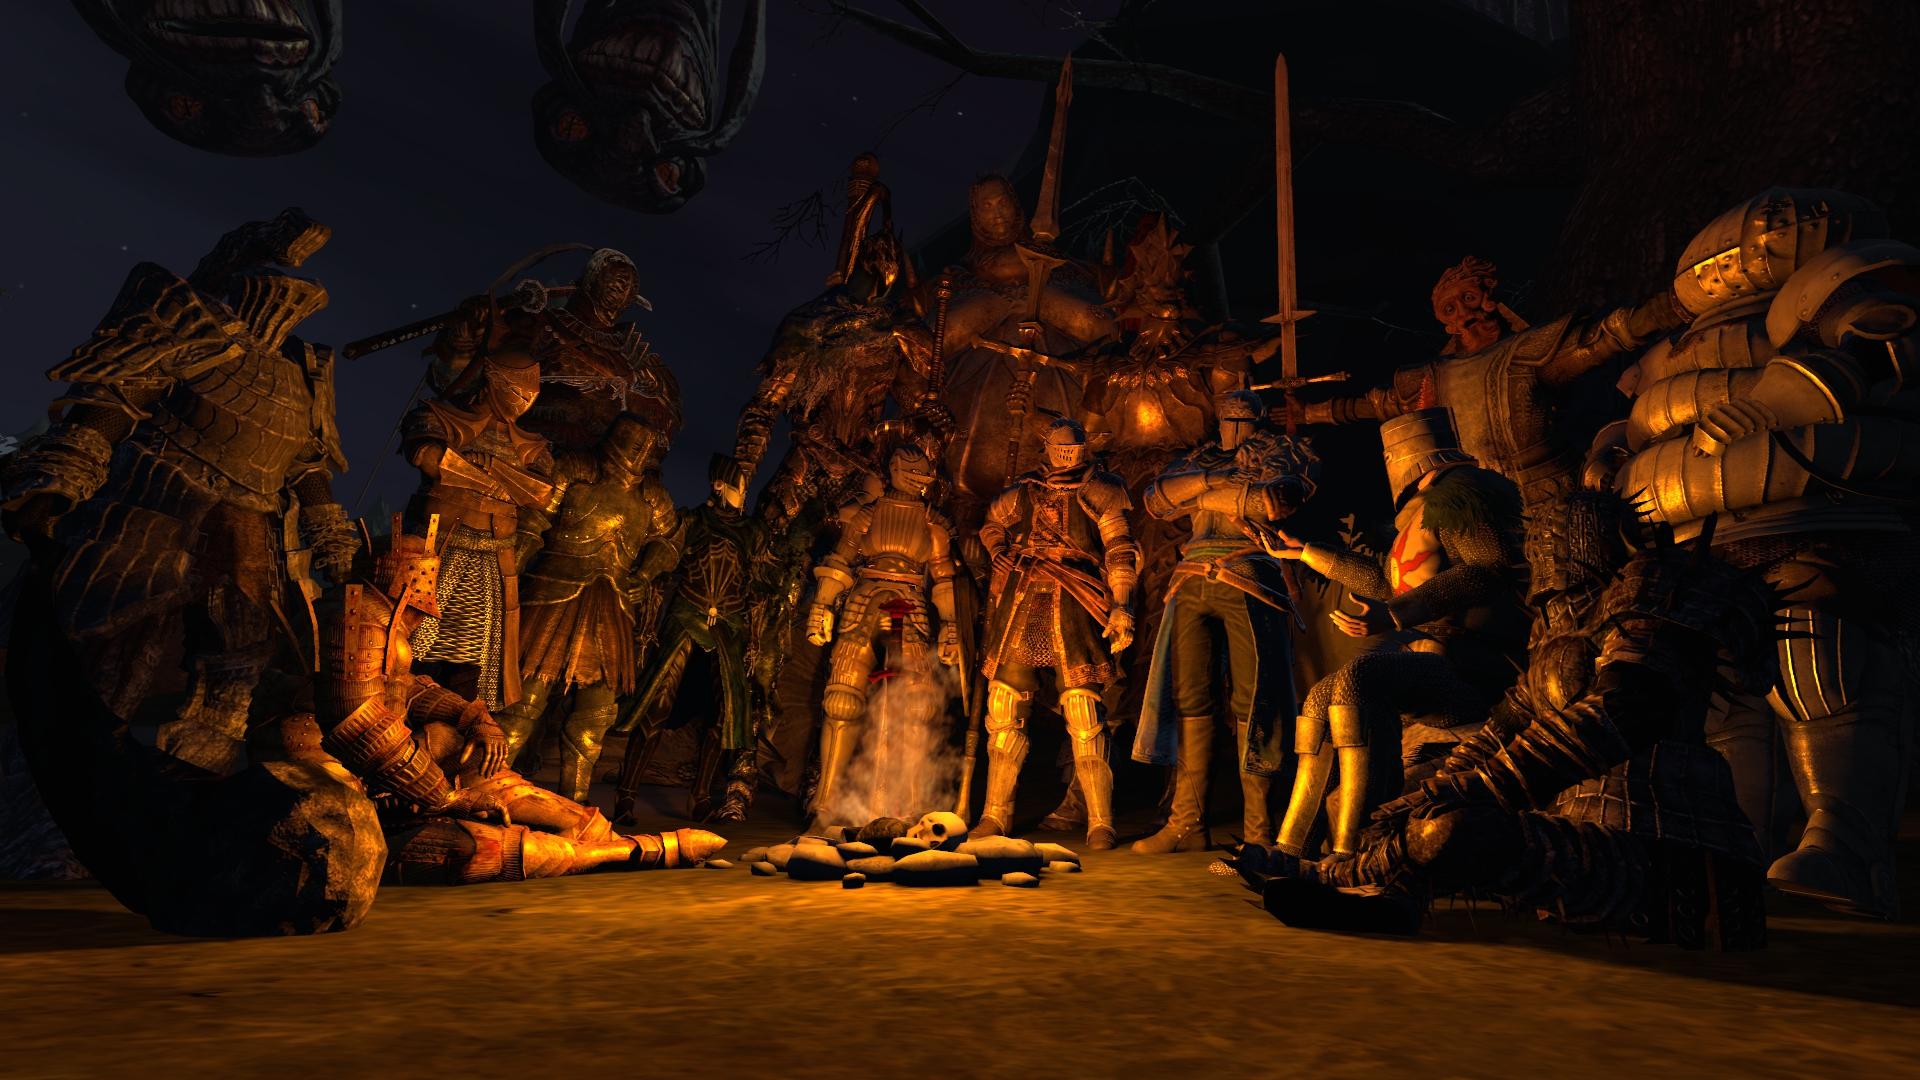 Dark Souls Bonfire Thing By Mirabeau Studios On Deviantart